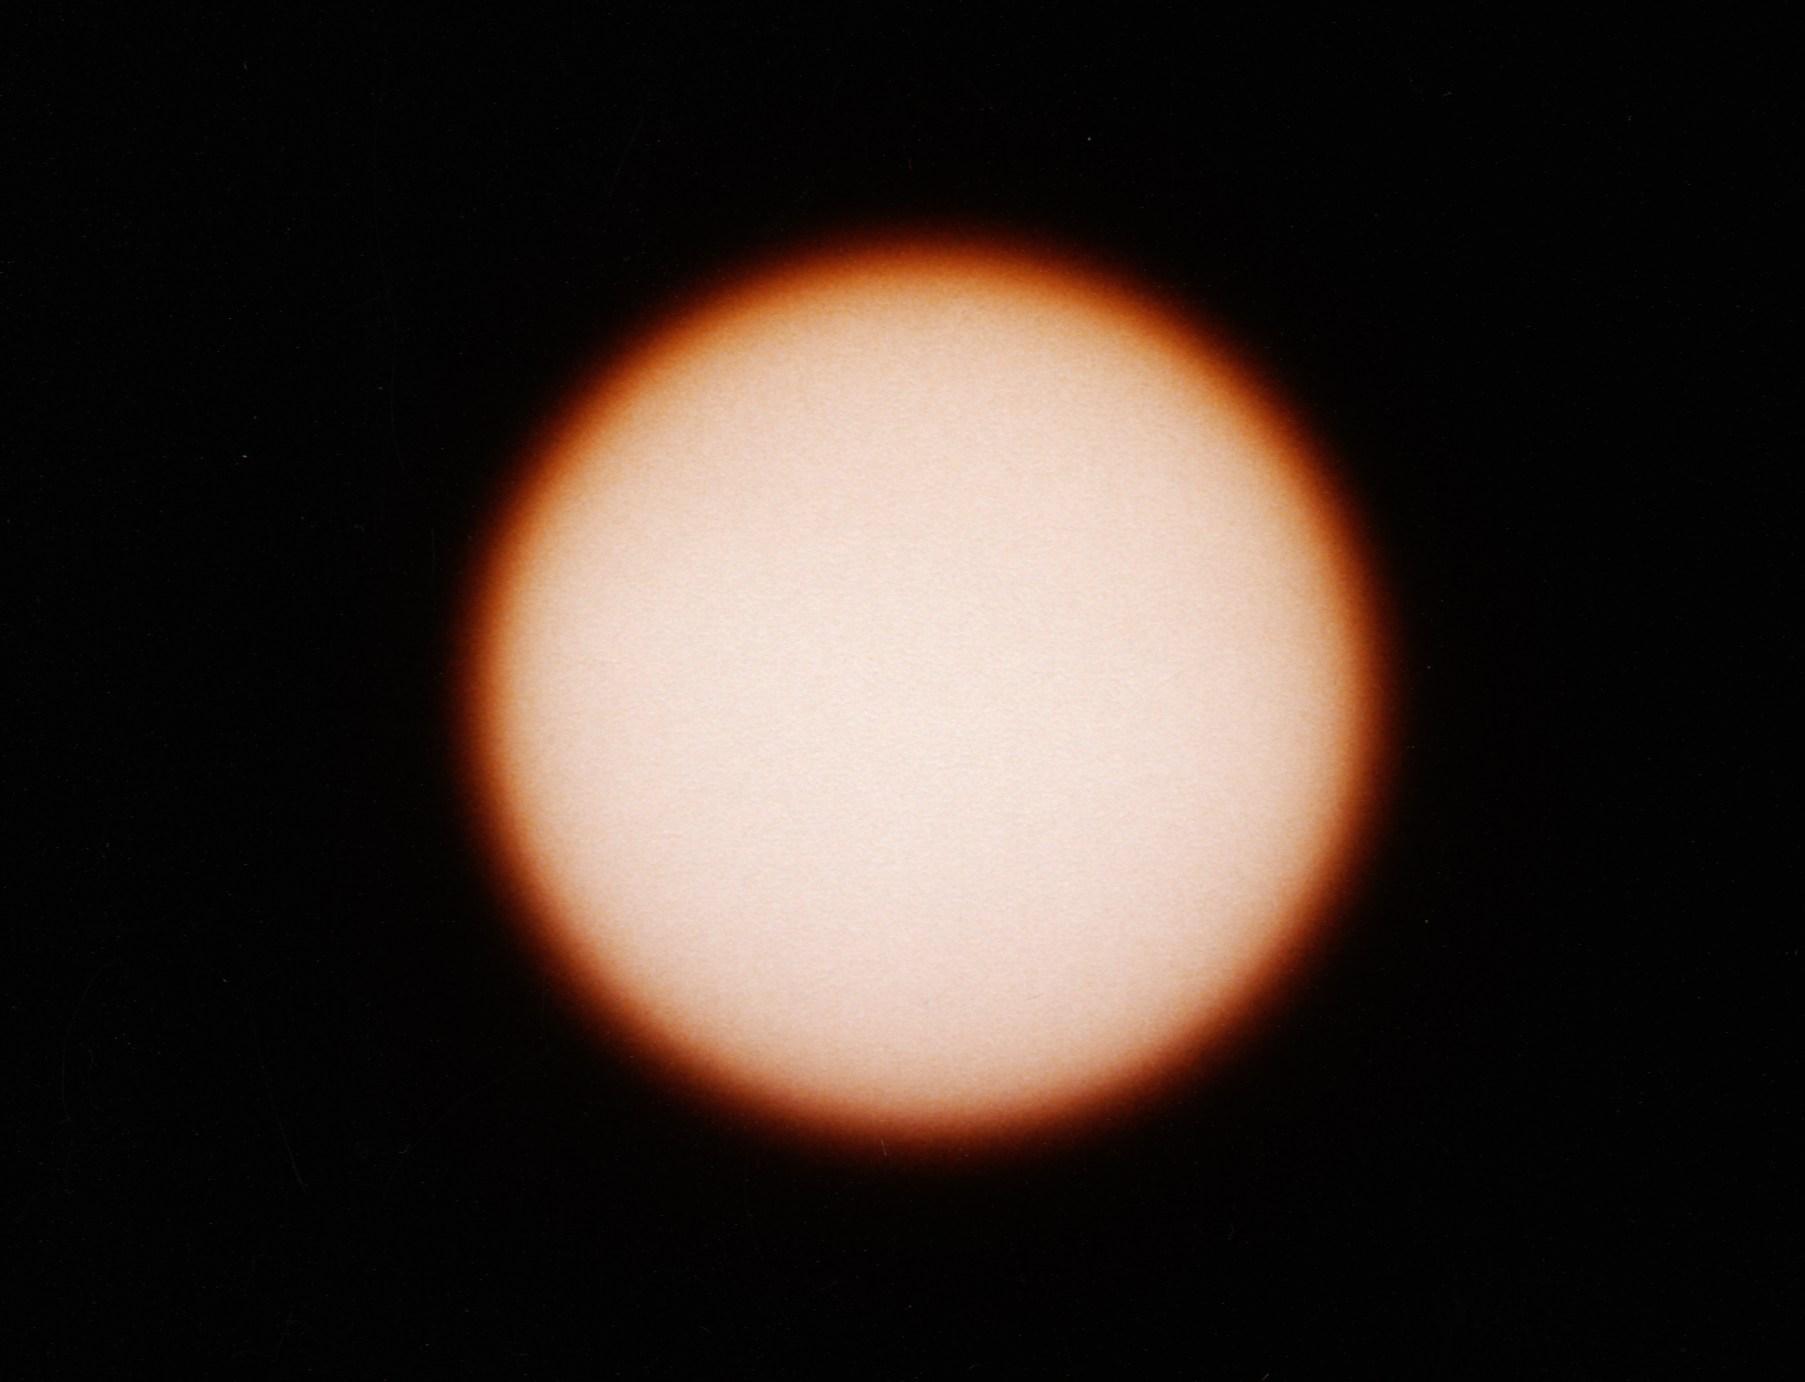 PhotoshopSunduchok - Как сделать эффект заката солнца 4